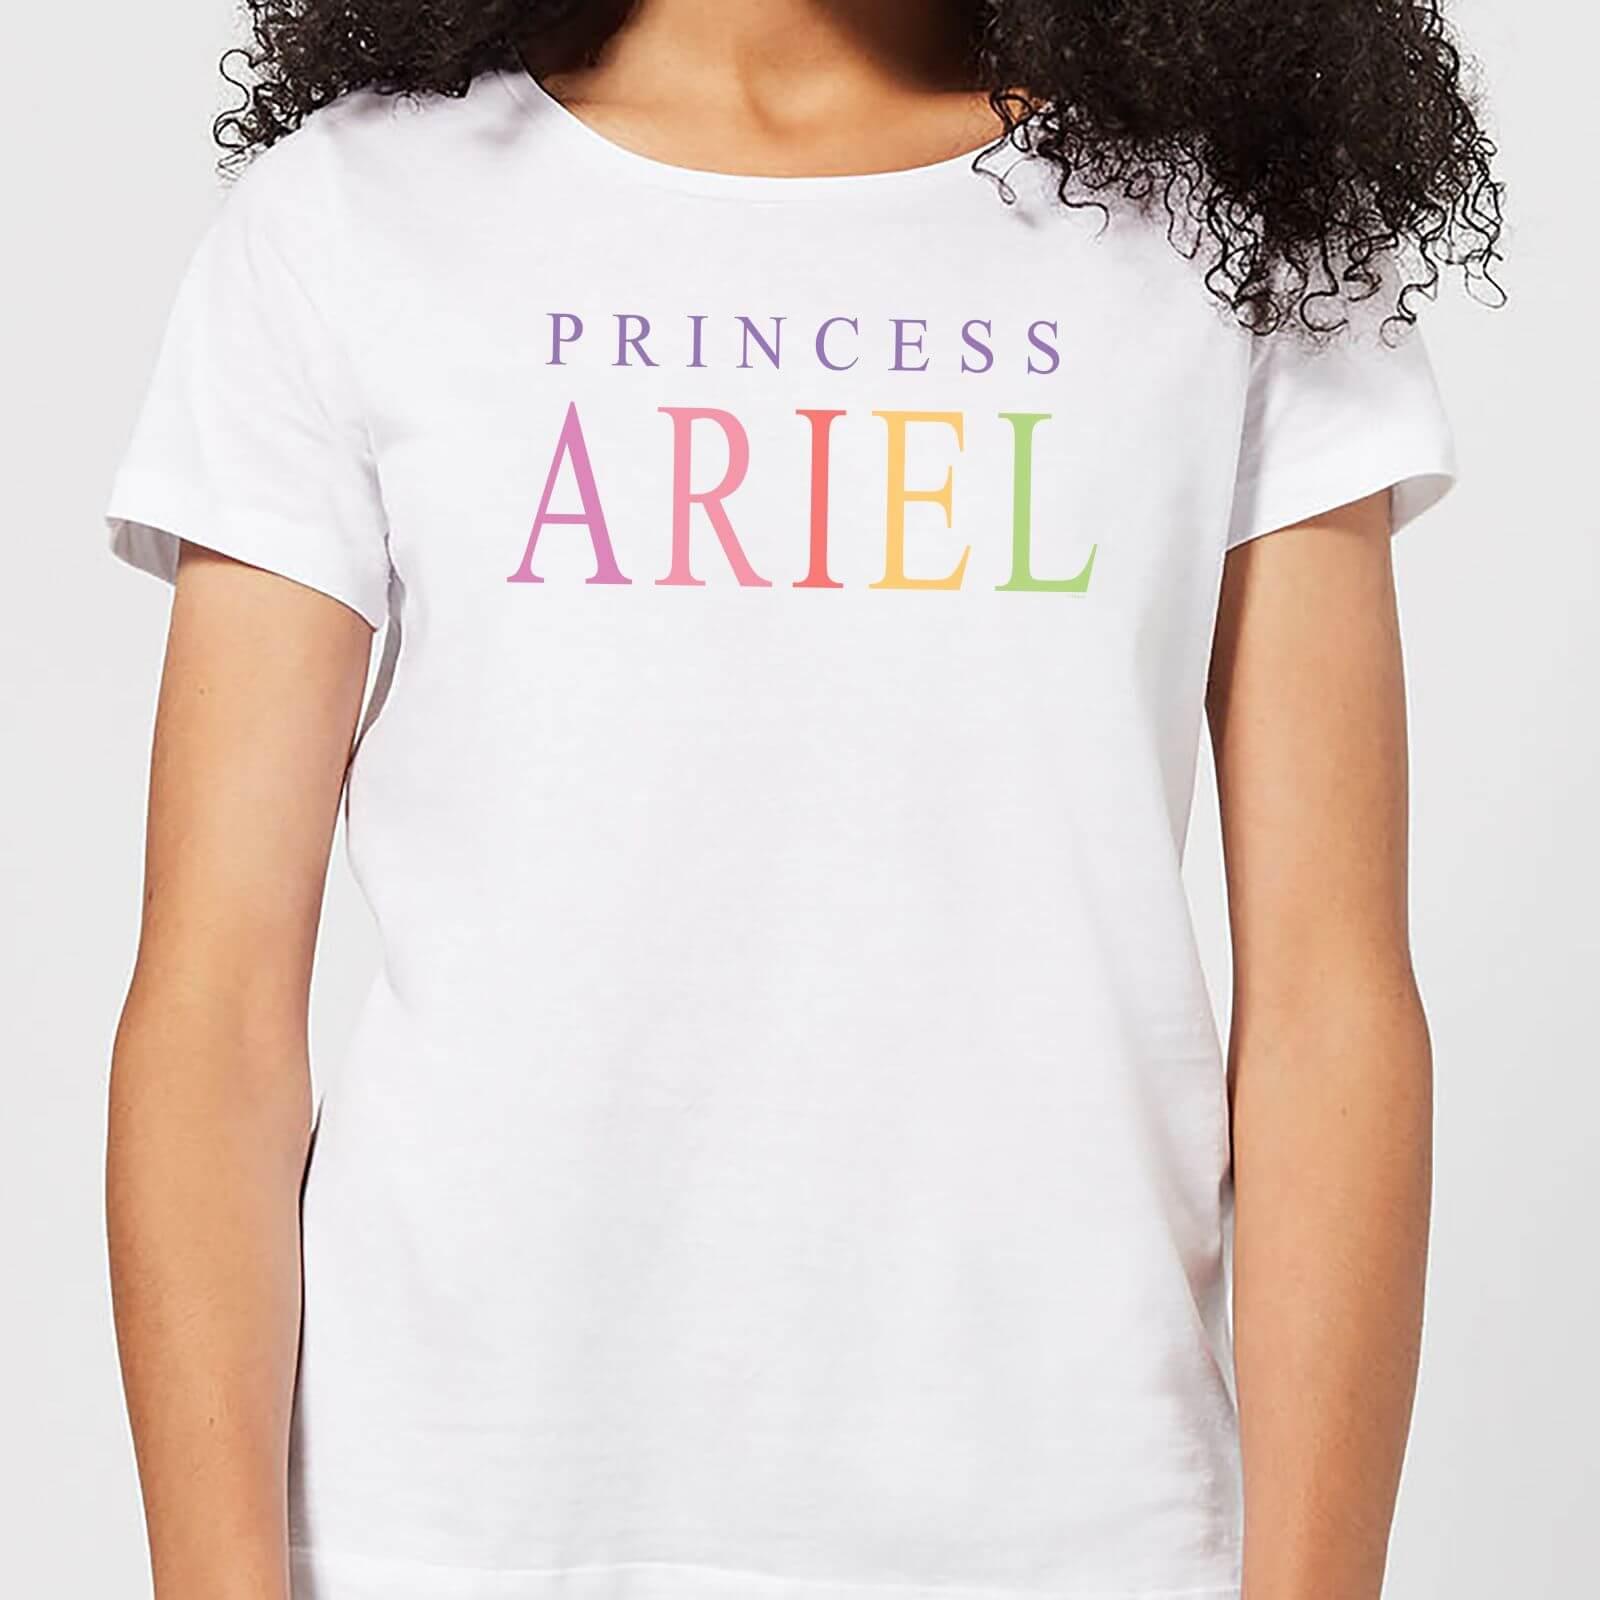 6d535ddc Disney Little Mermaid Princess Ariel Women's T-Shirt - White   Pop In A Box  UK